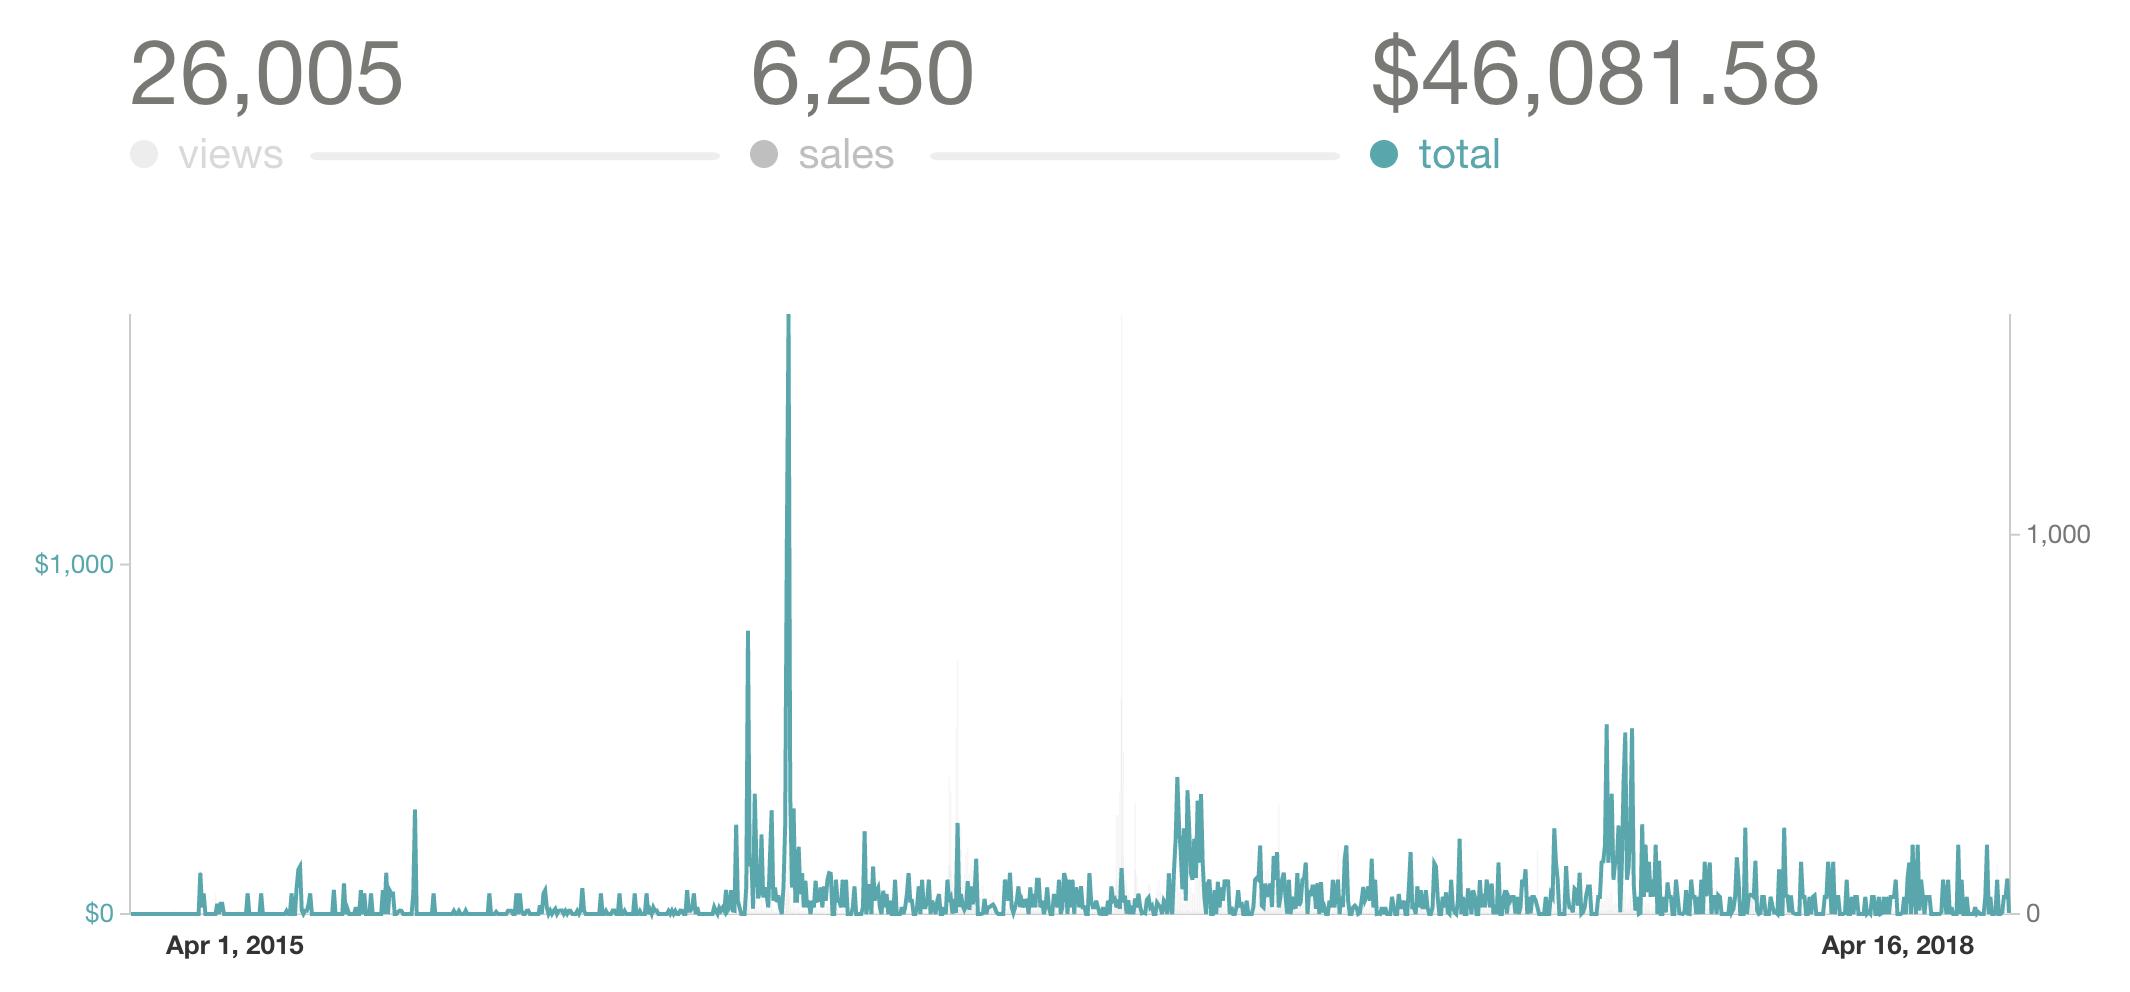 Gumroad book sales Apr 2015 to Apr 2018